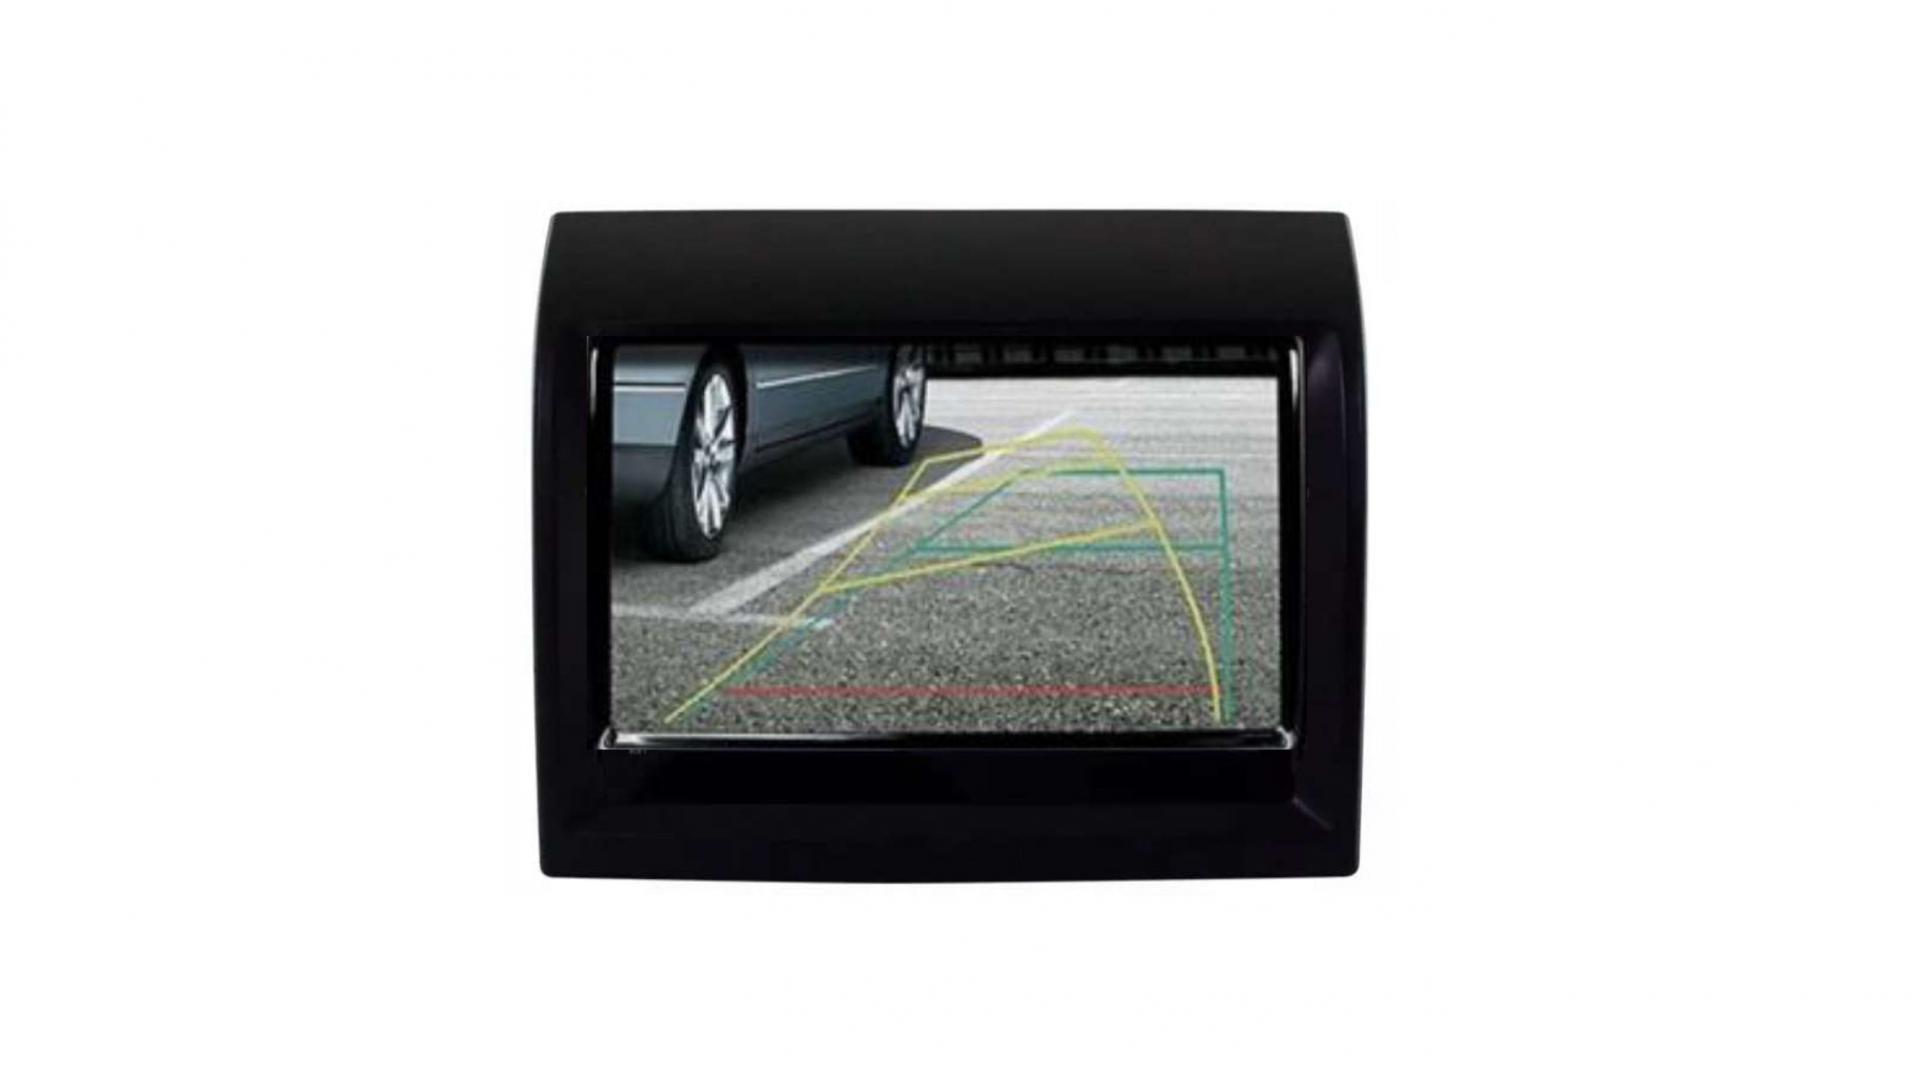 Fiat ducato autoradio gps bluetooth android auto carplay camera de recul commande au volant4